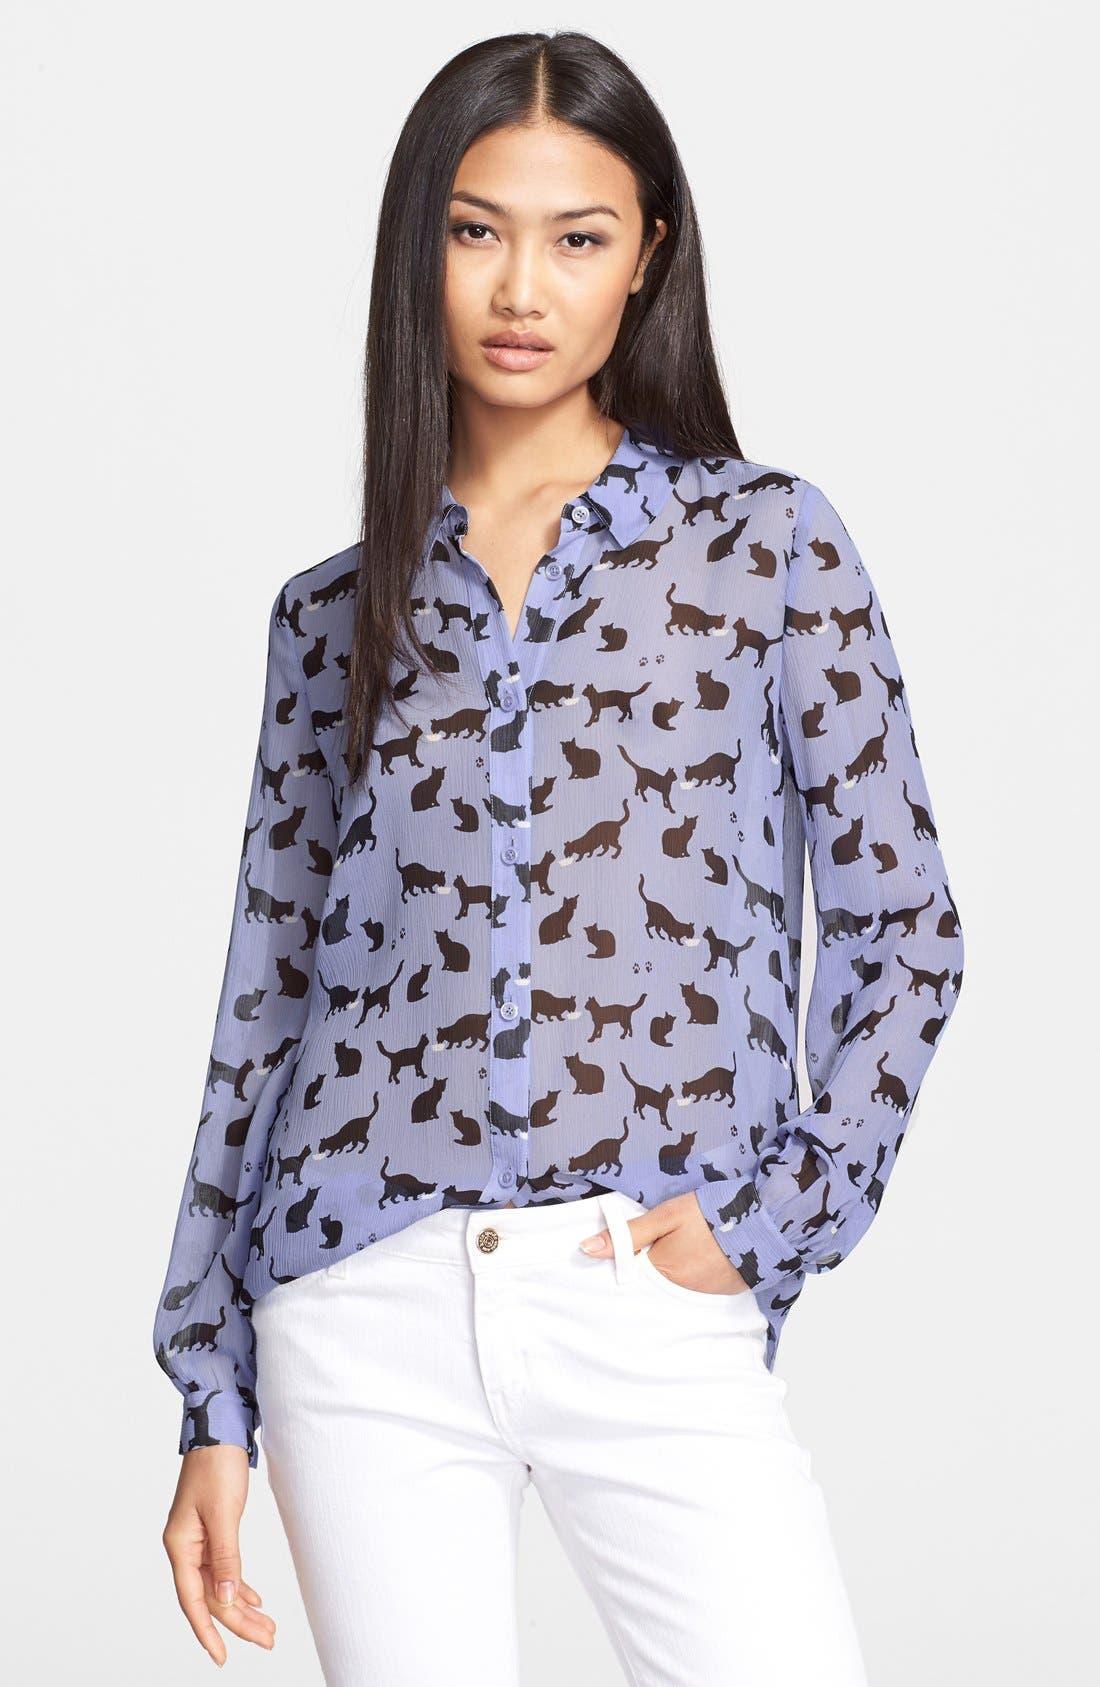 Alternate Image 1 Selected - kate spade new york 'cats and cream' silk chiffon shirt